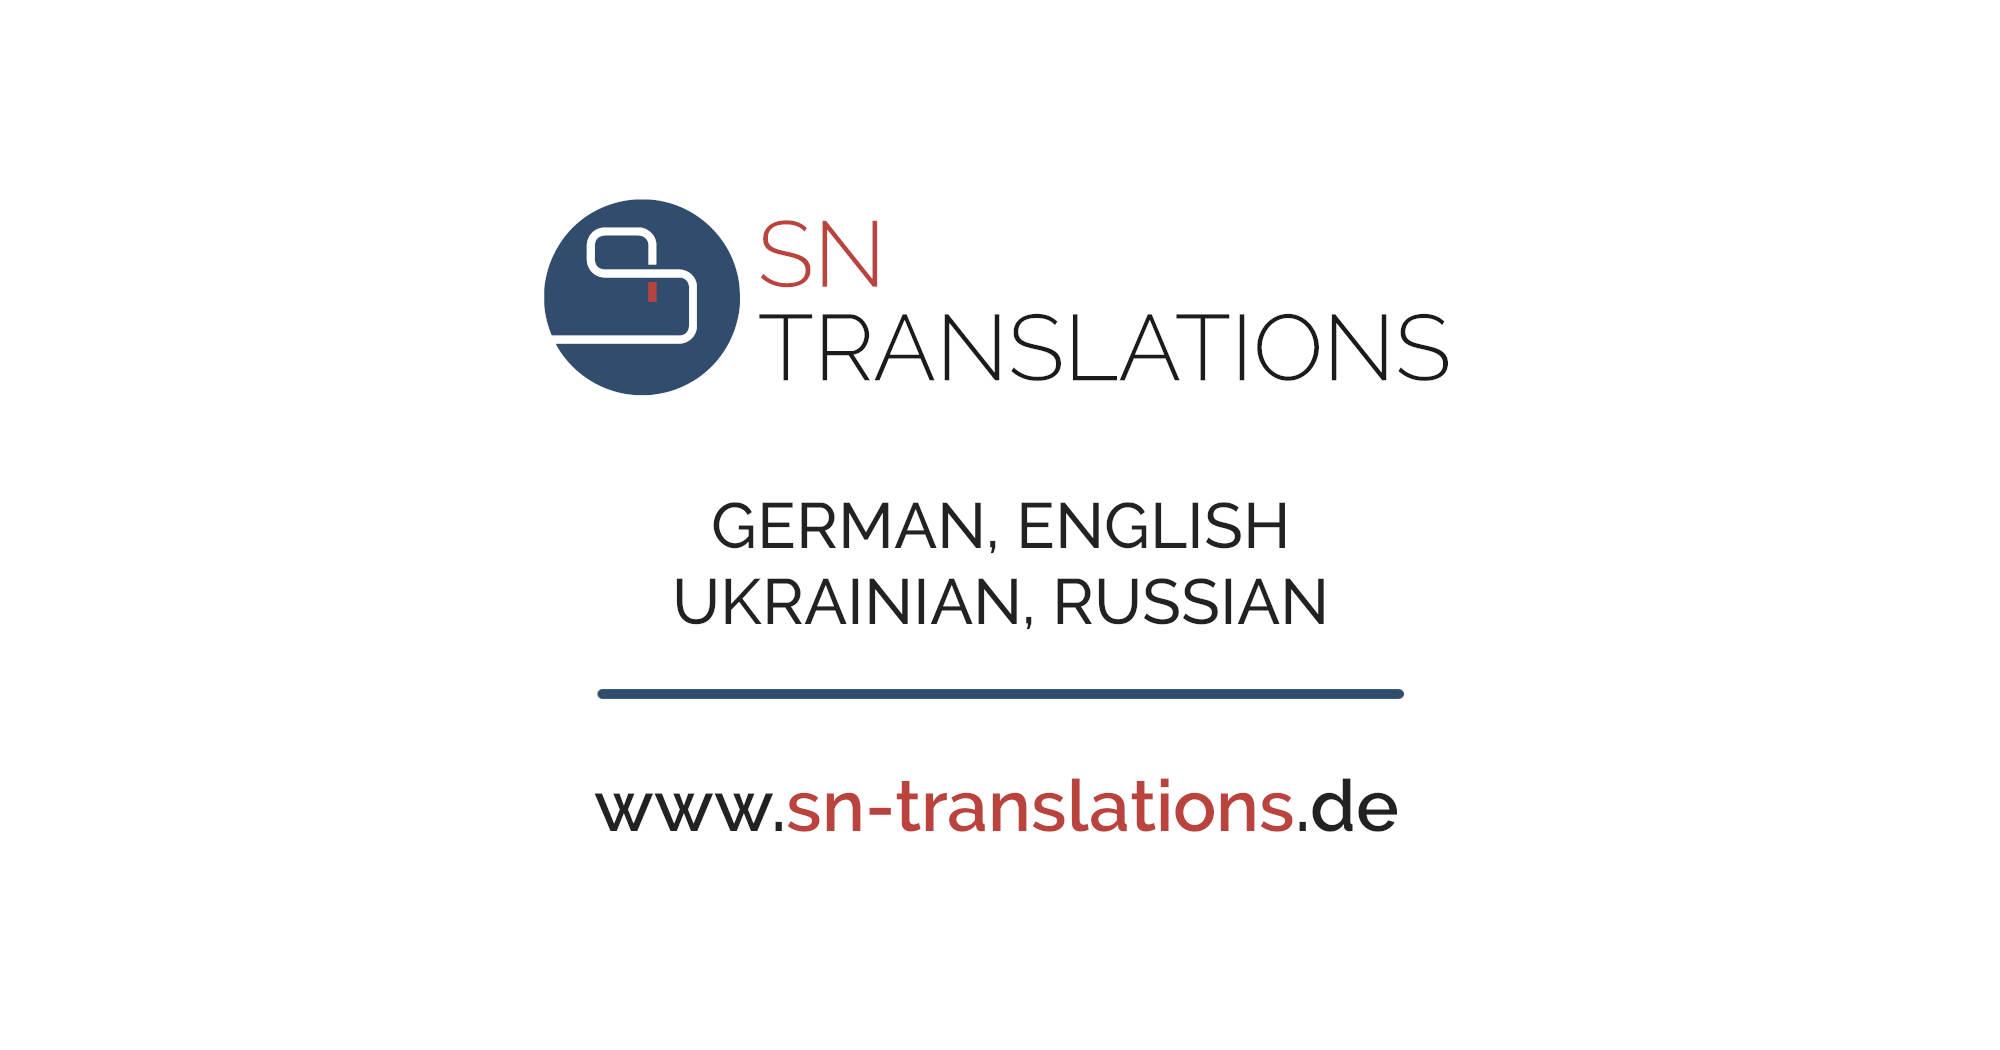 OpenGraph: Facebook - SN Translations • Übersetzungsbüro • Deutsch, Englisch, Ukrainisch, Russisch